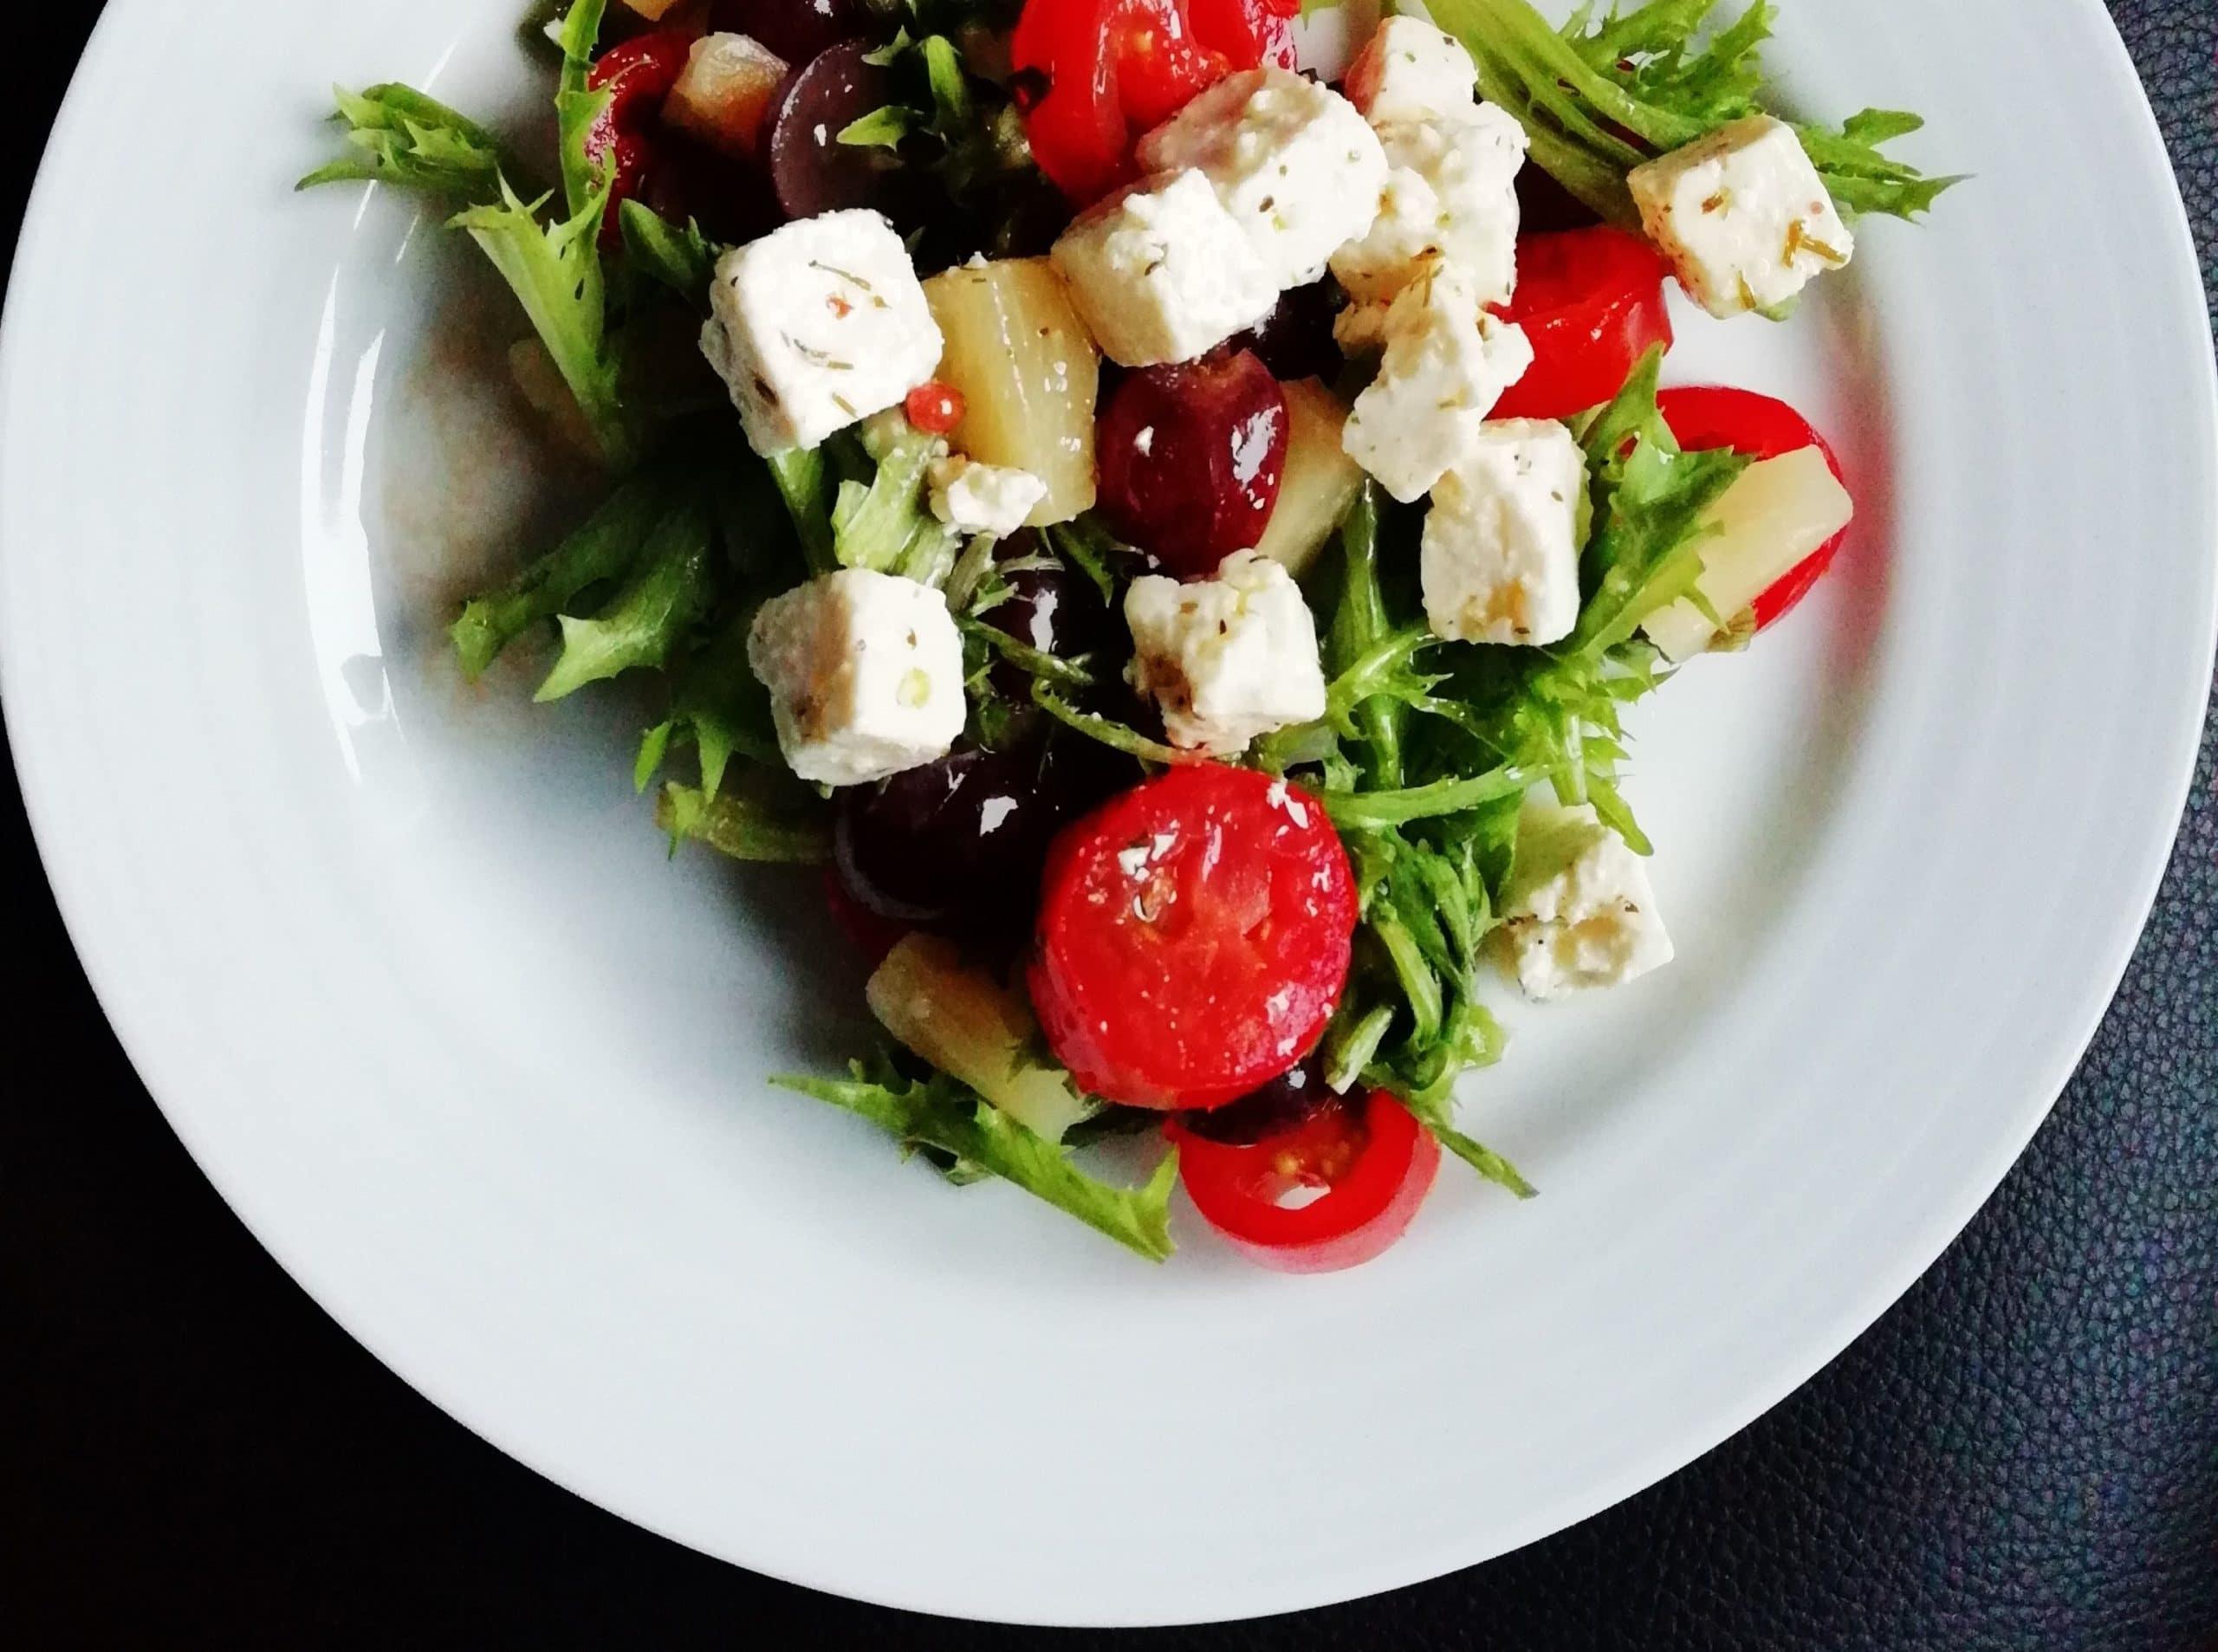 Frisée-Salat mit Cherrytomaten, Feta-Käse und Oliven